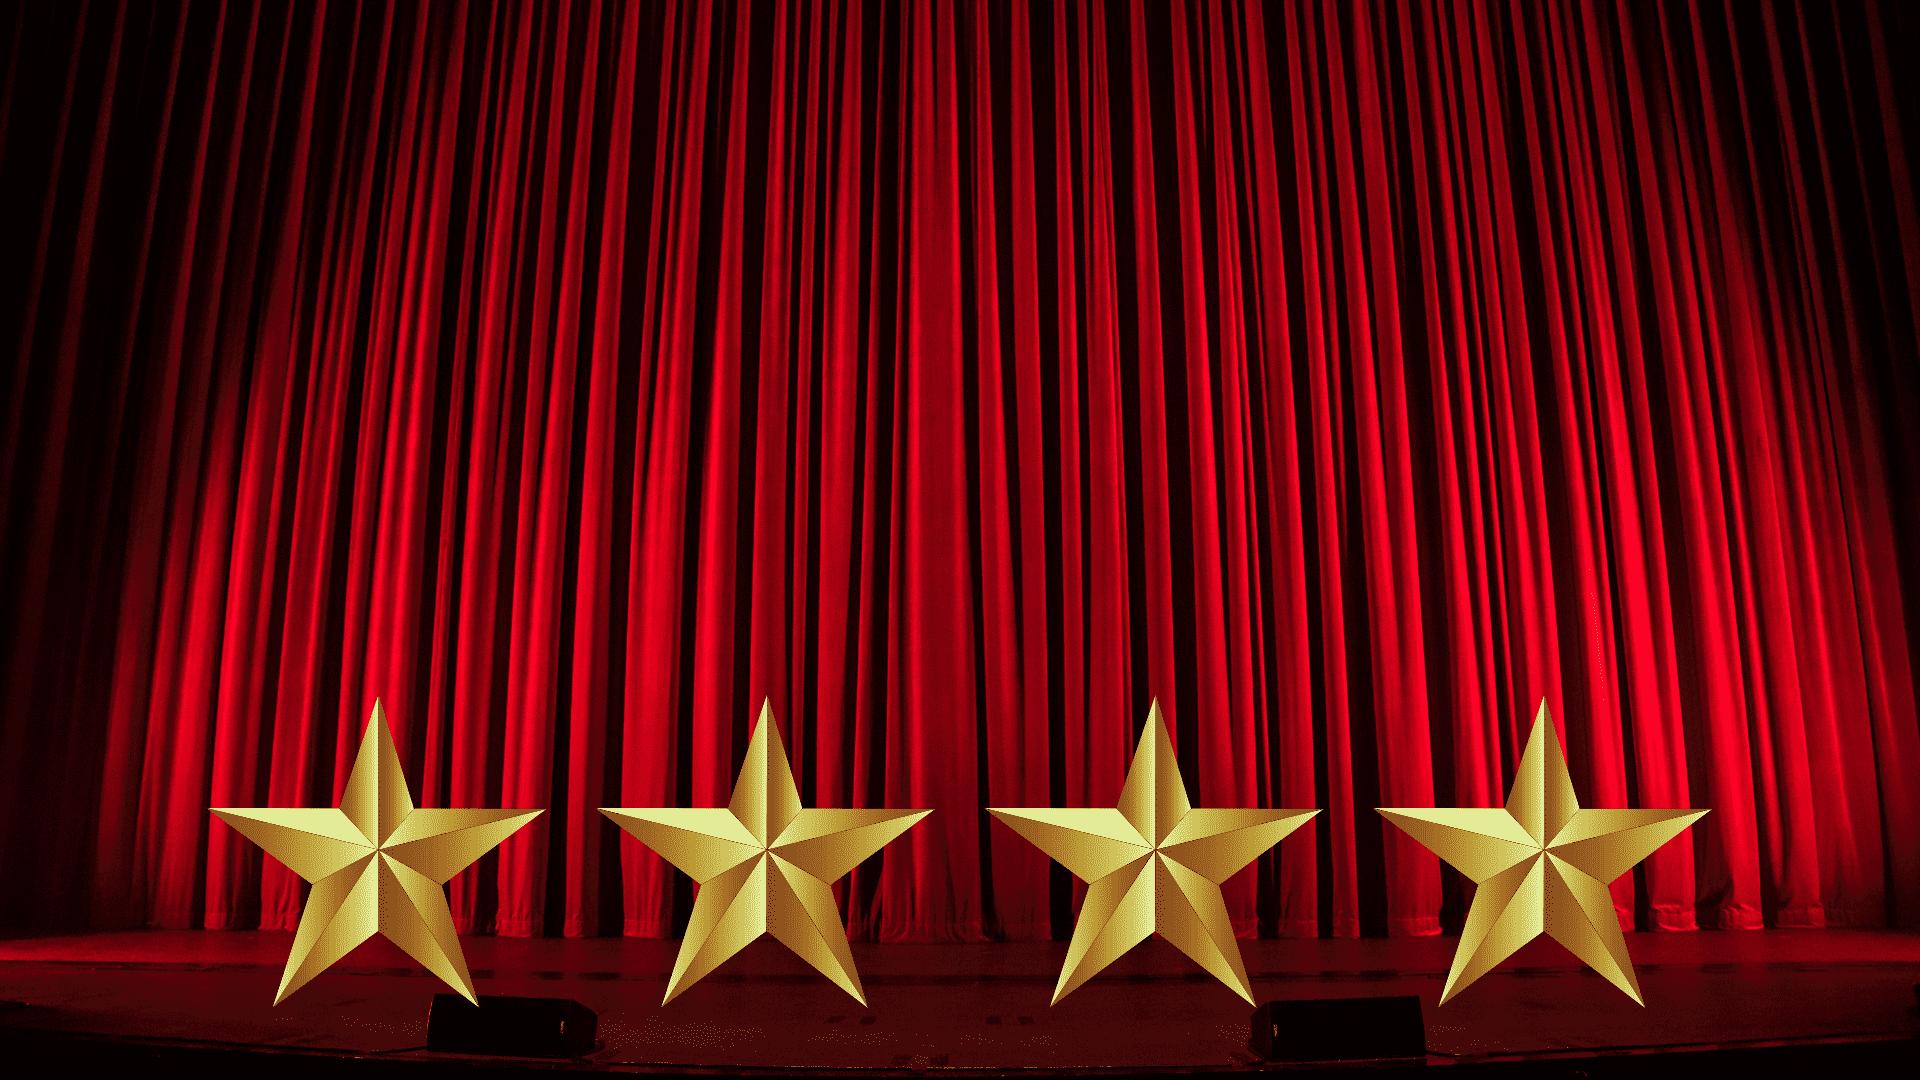 KCM Earns 4-stars with Charity Navigator